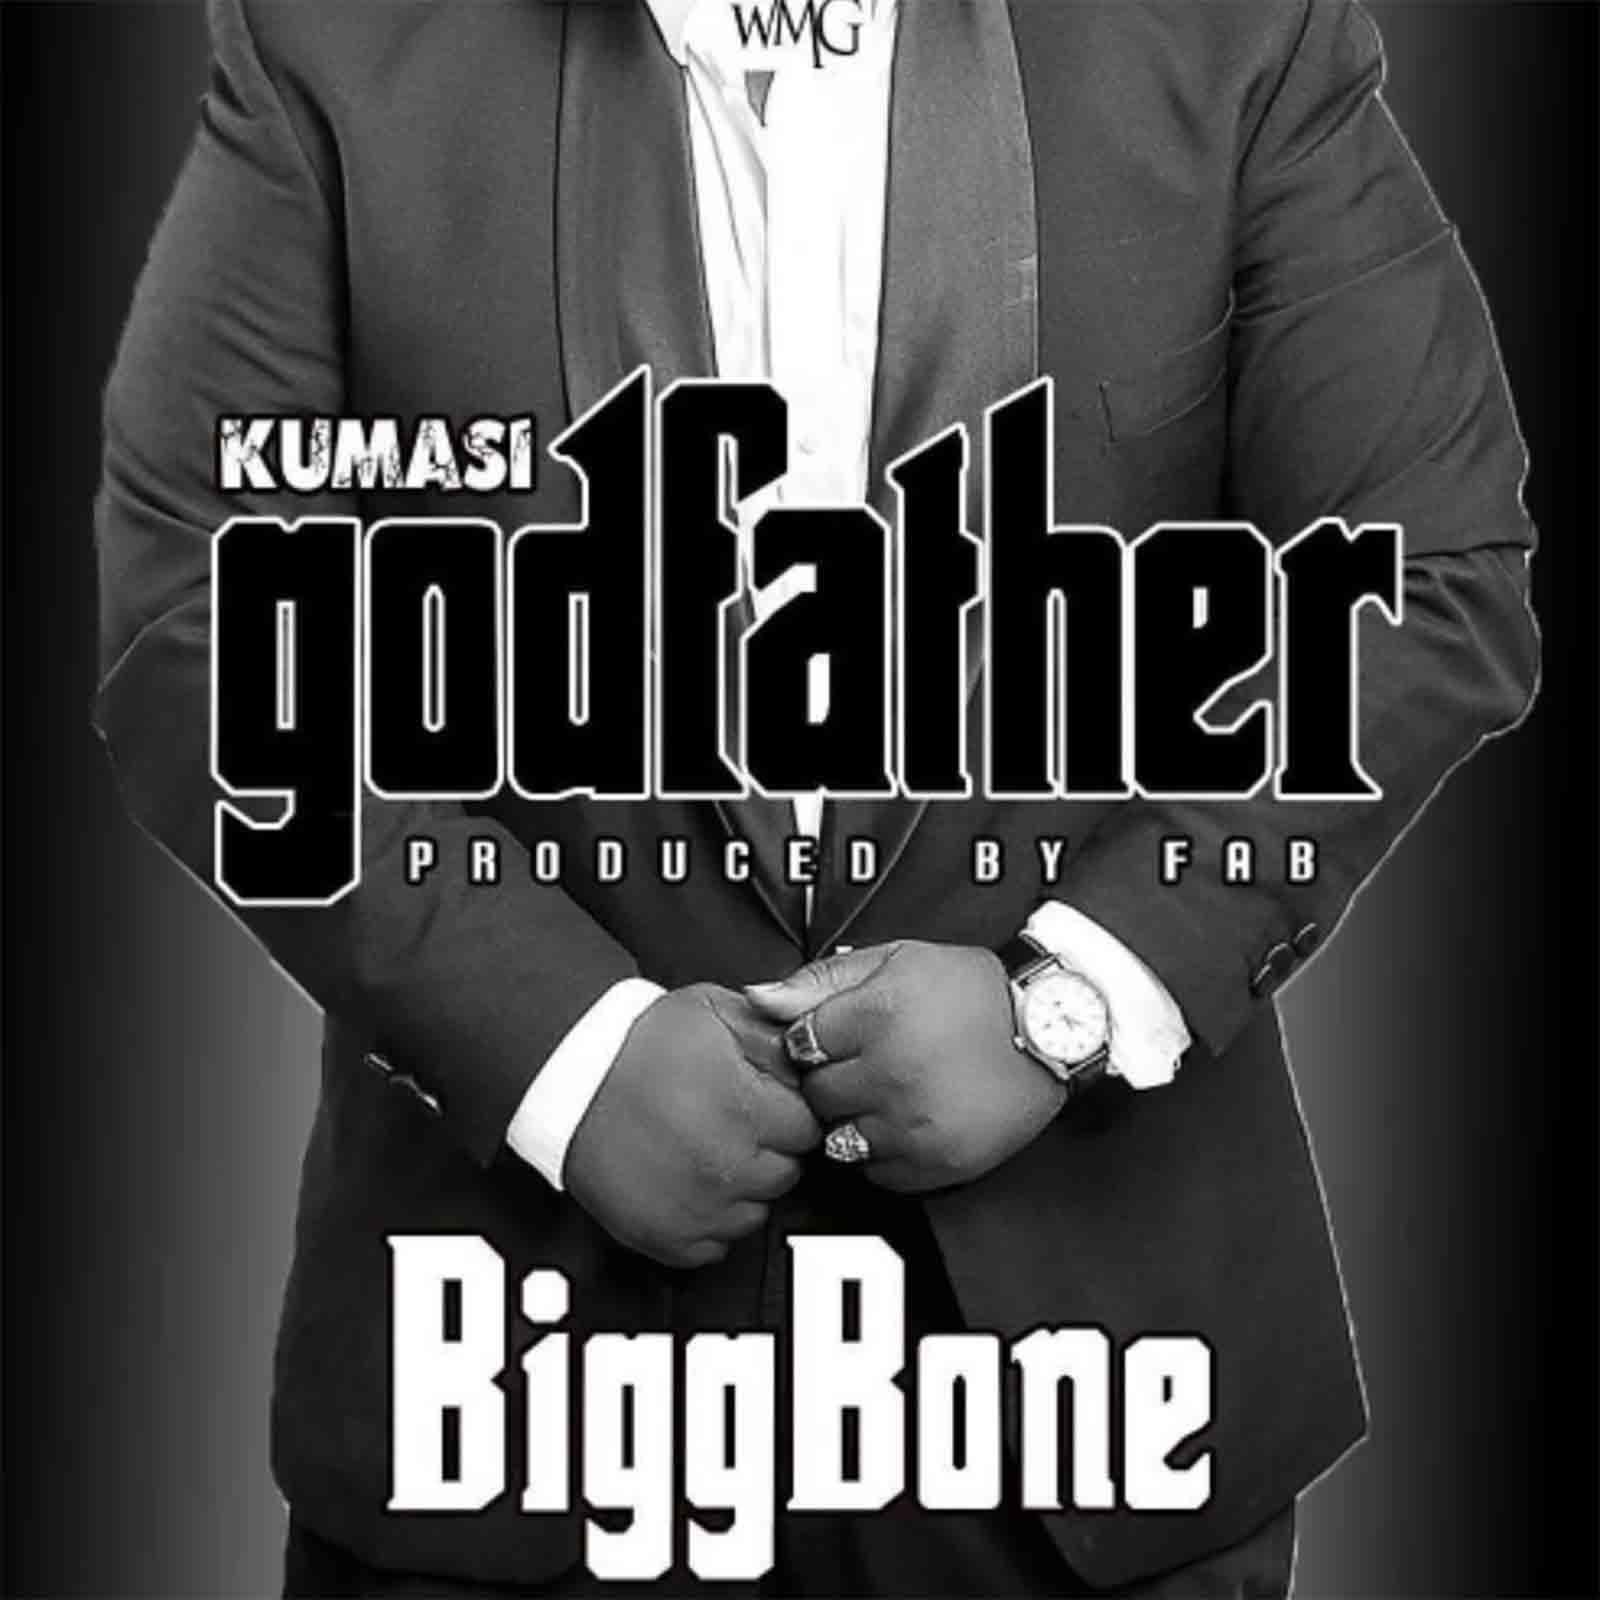 Kumasi godfather by BiggBone